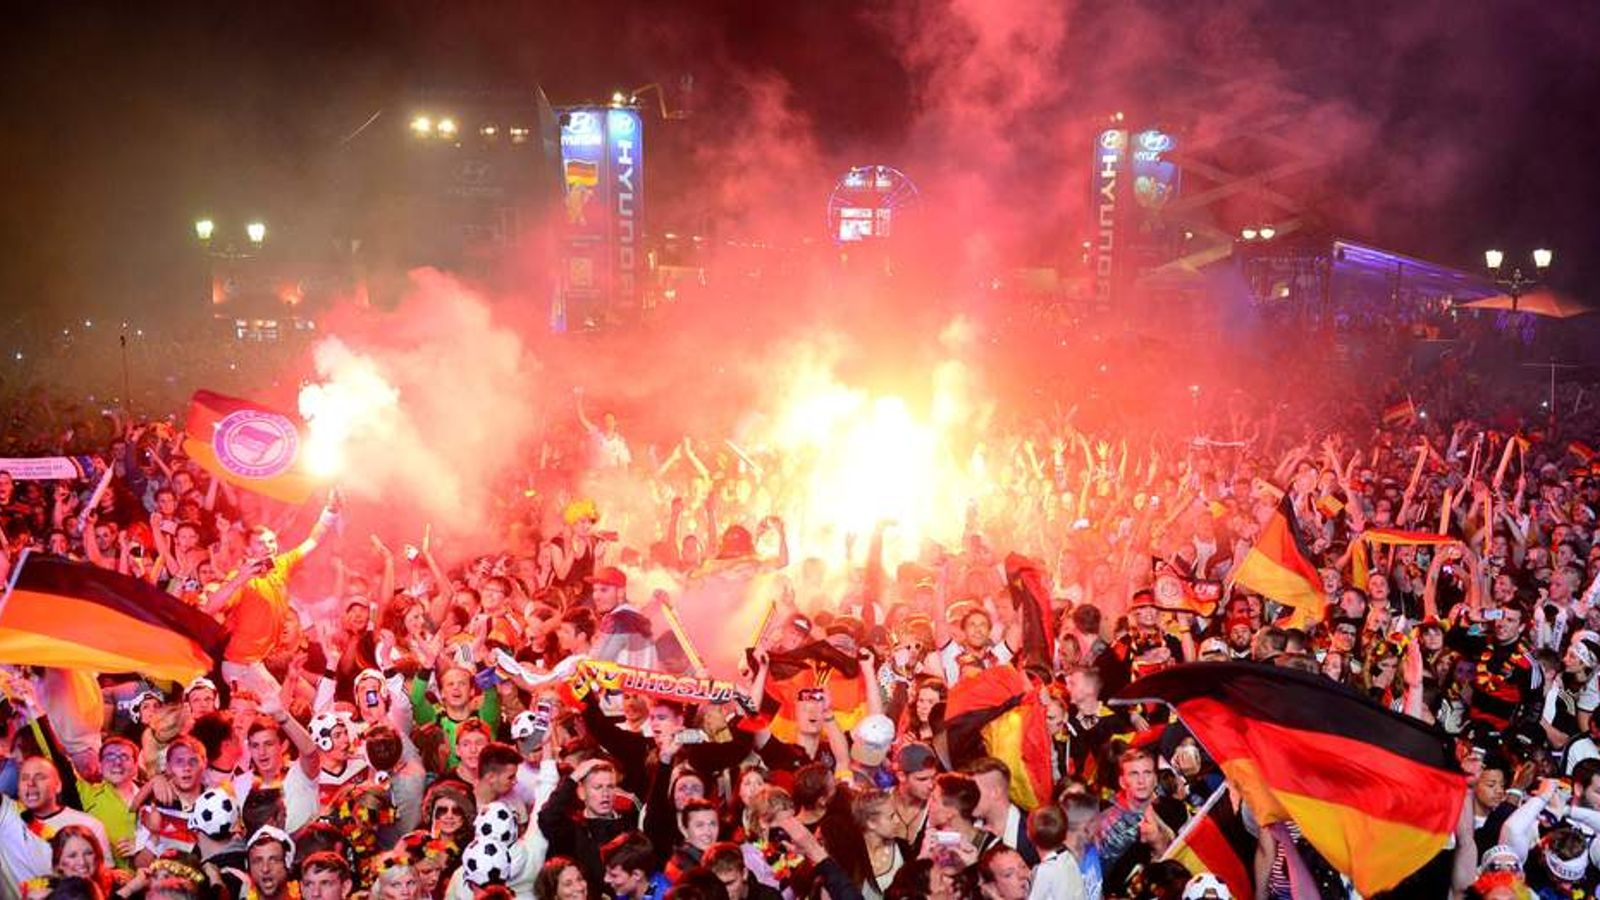 German fans celebrate at an outdoor screening near the Brandenburg Gate in Berlin.